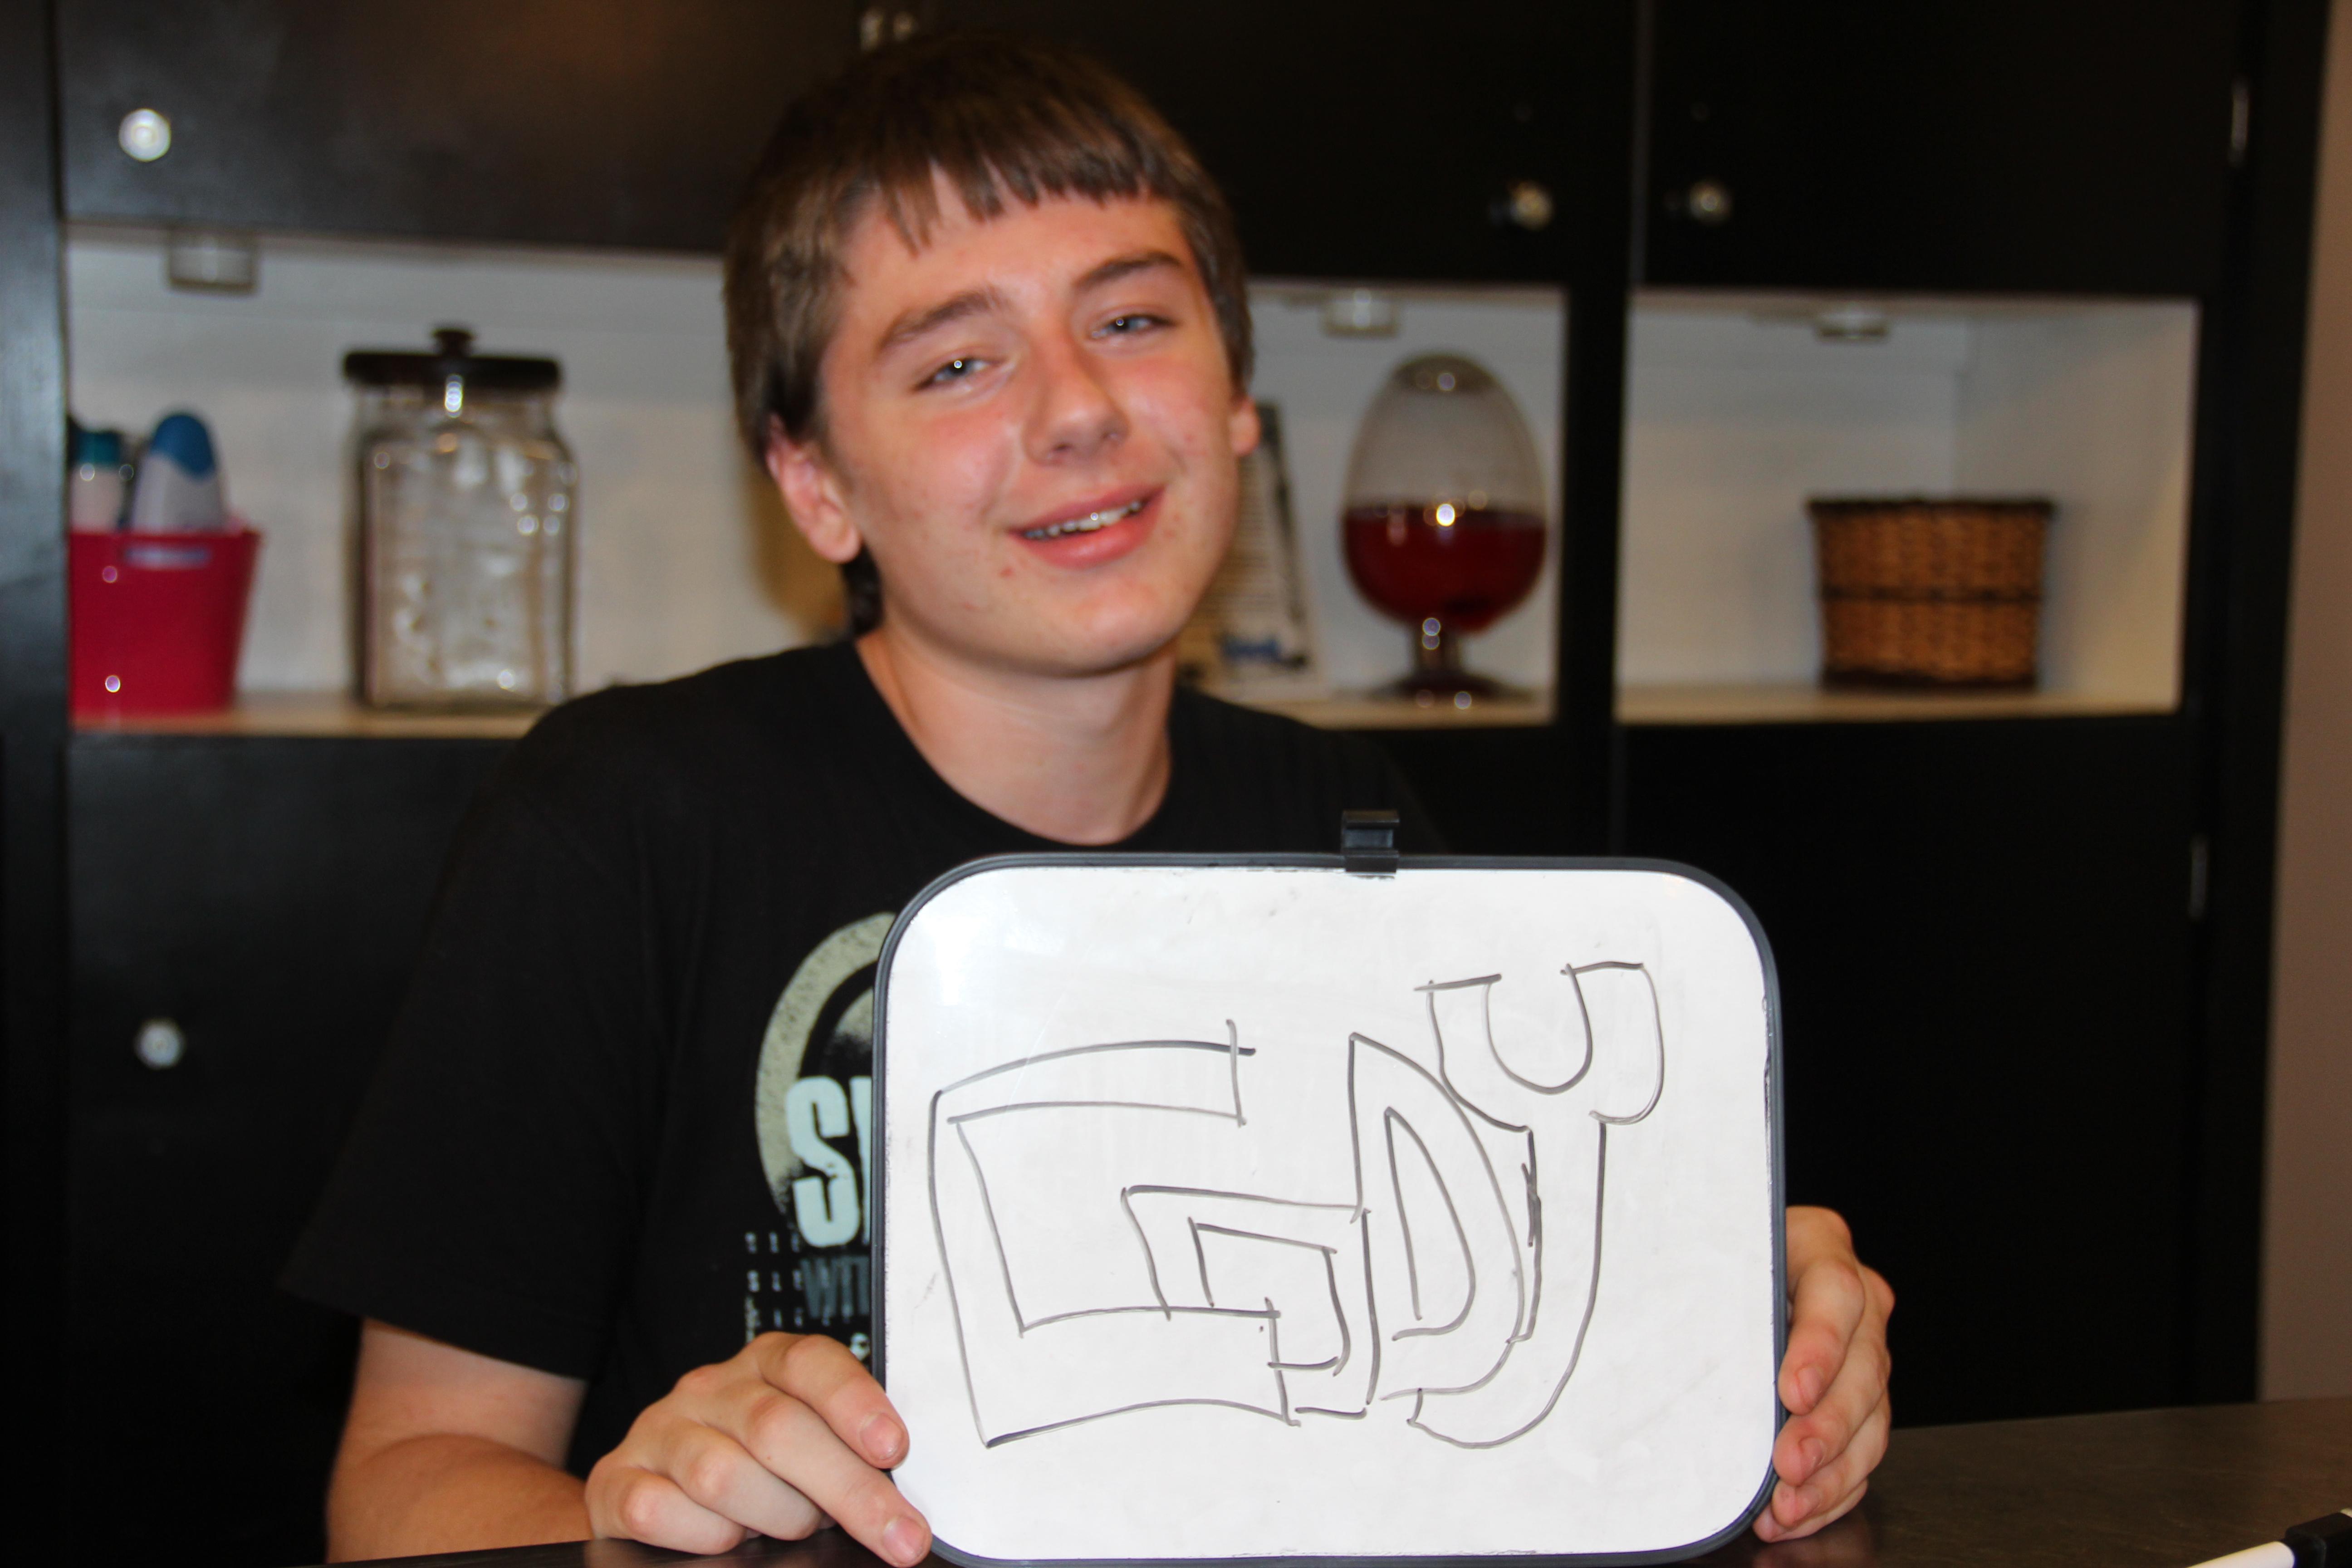 Cody-001.JPG